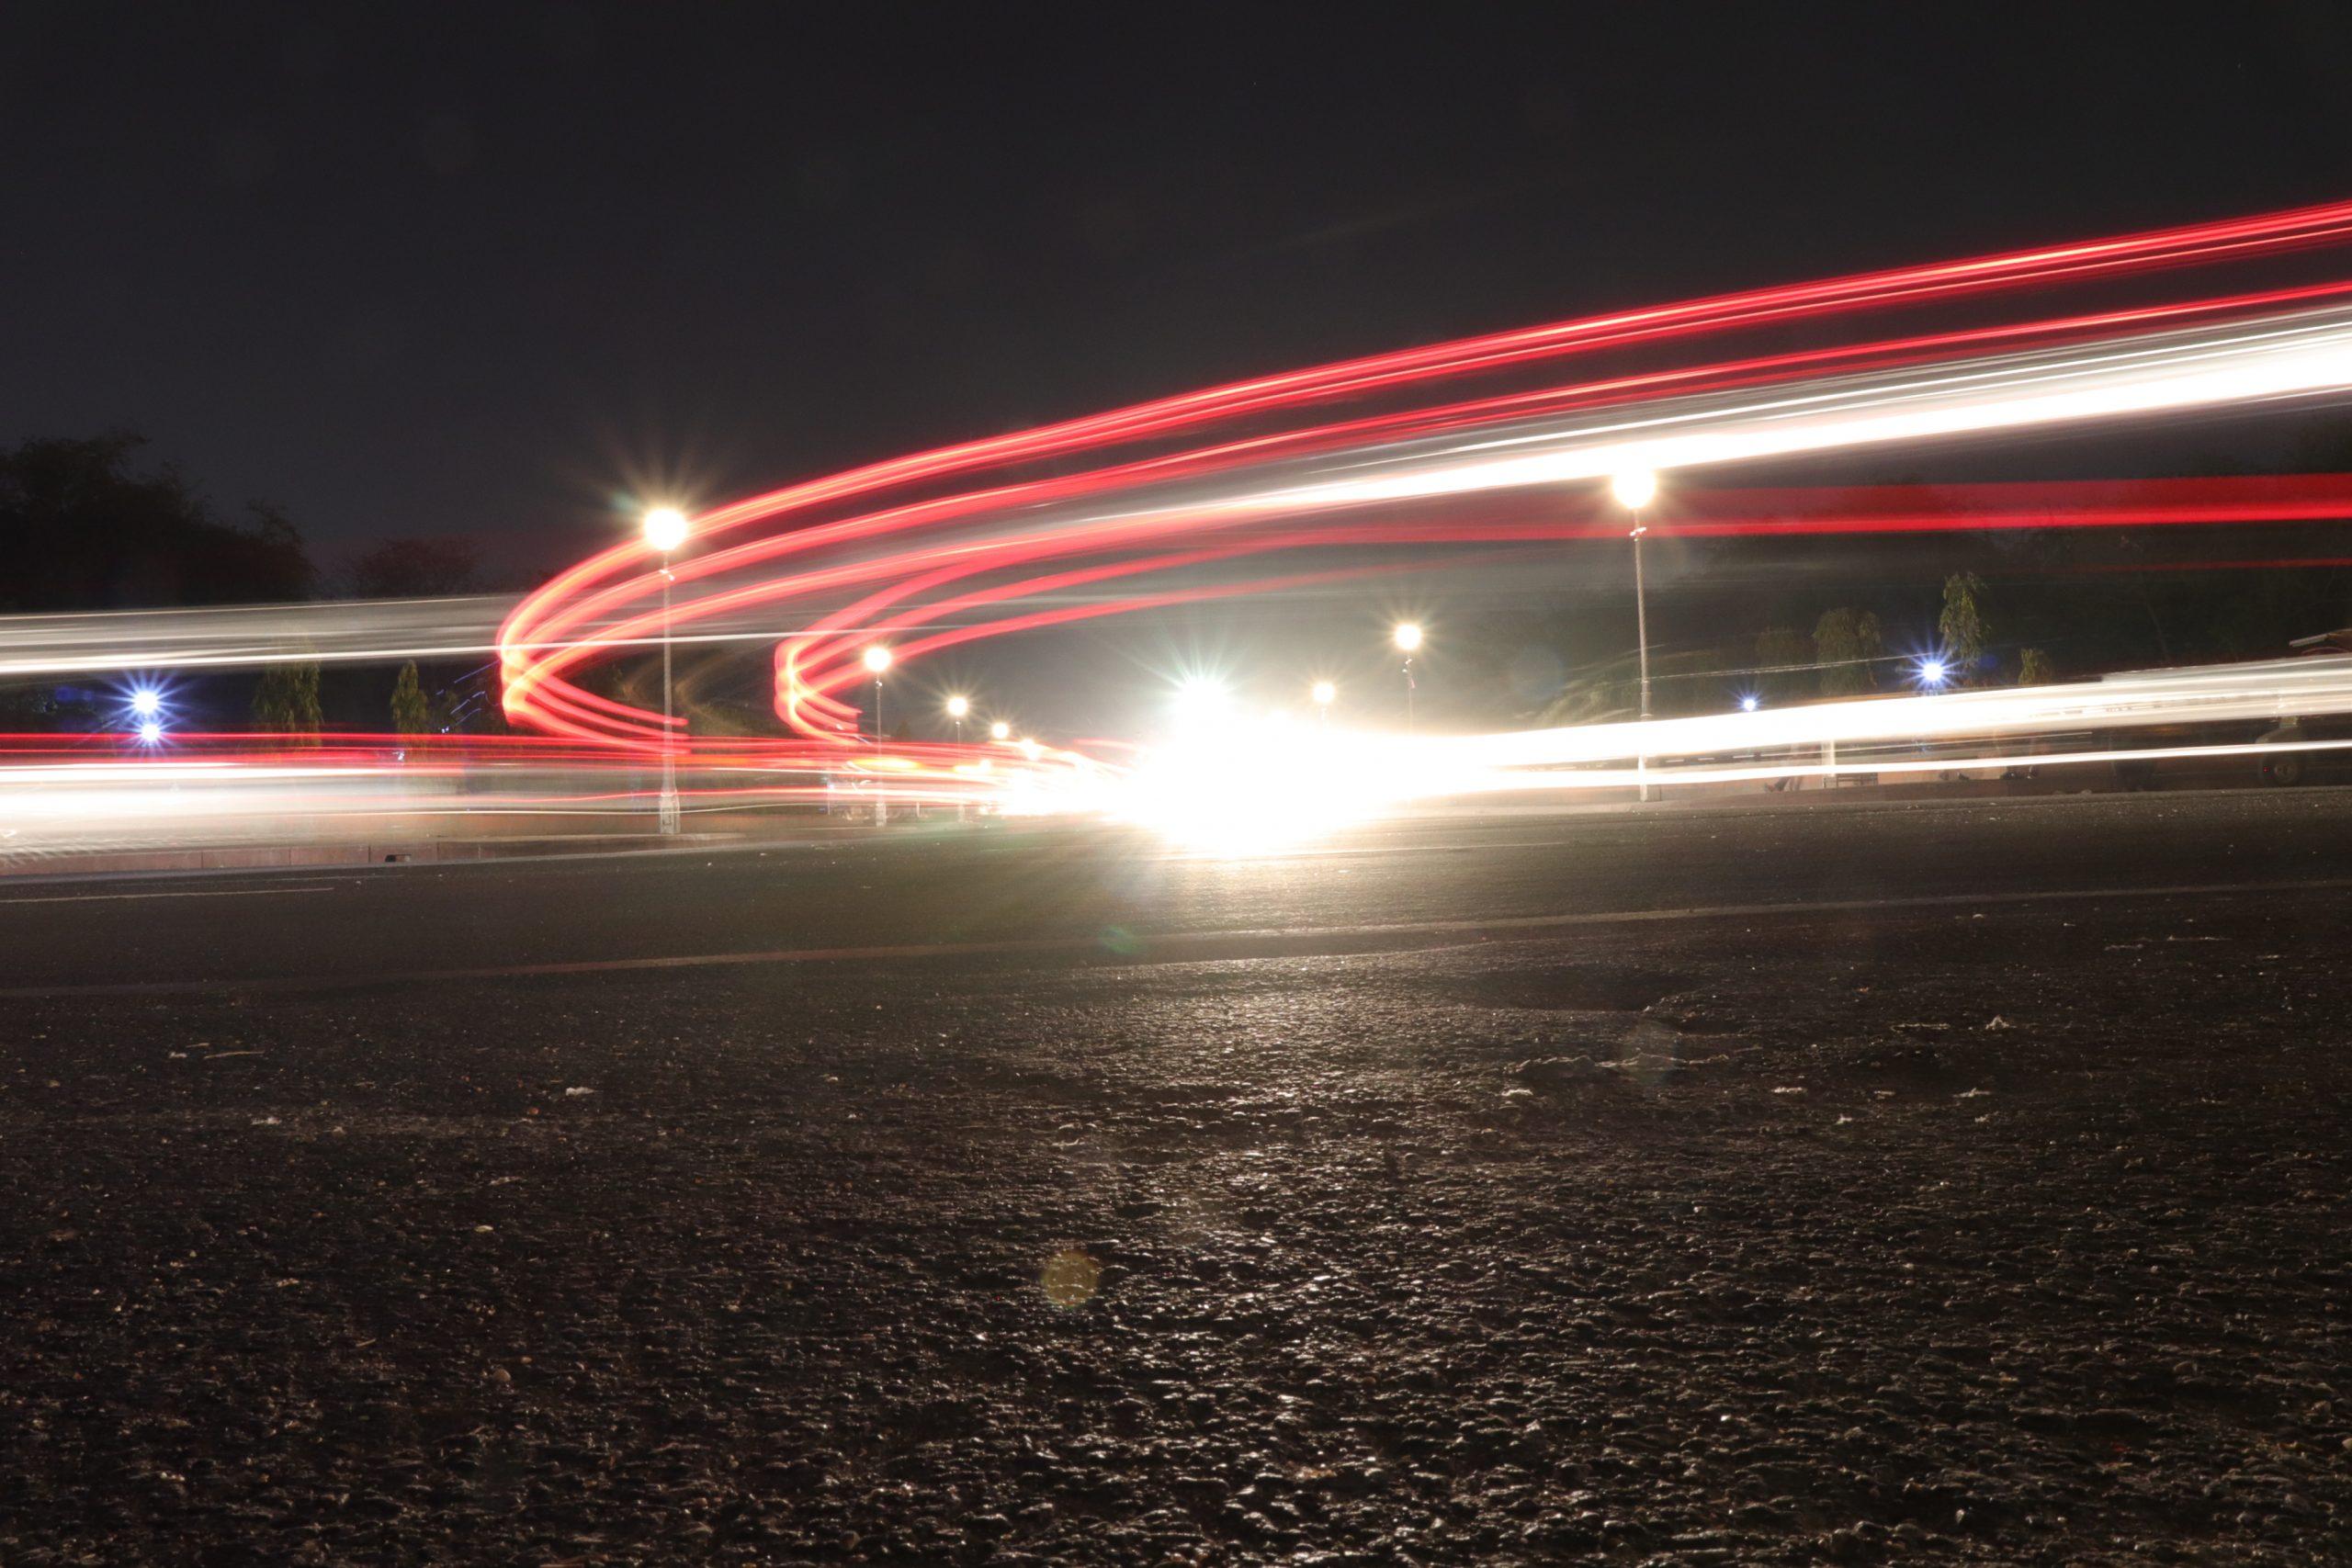 headlights of vehicles during night